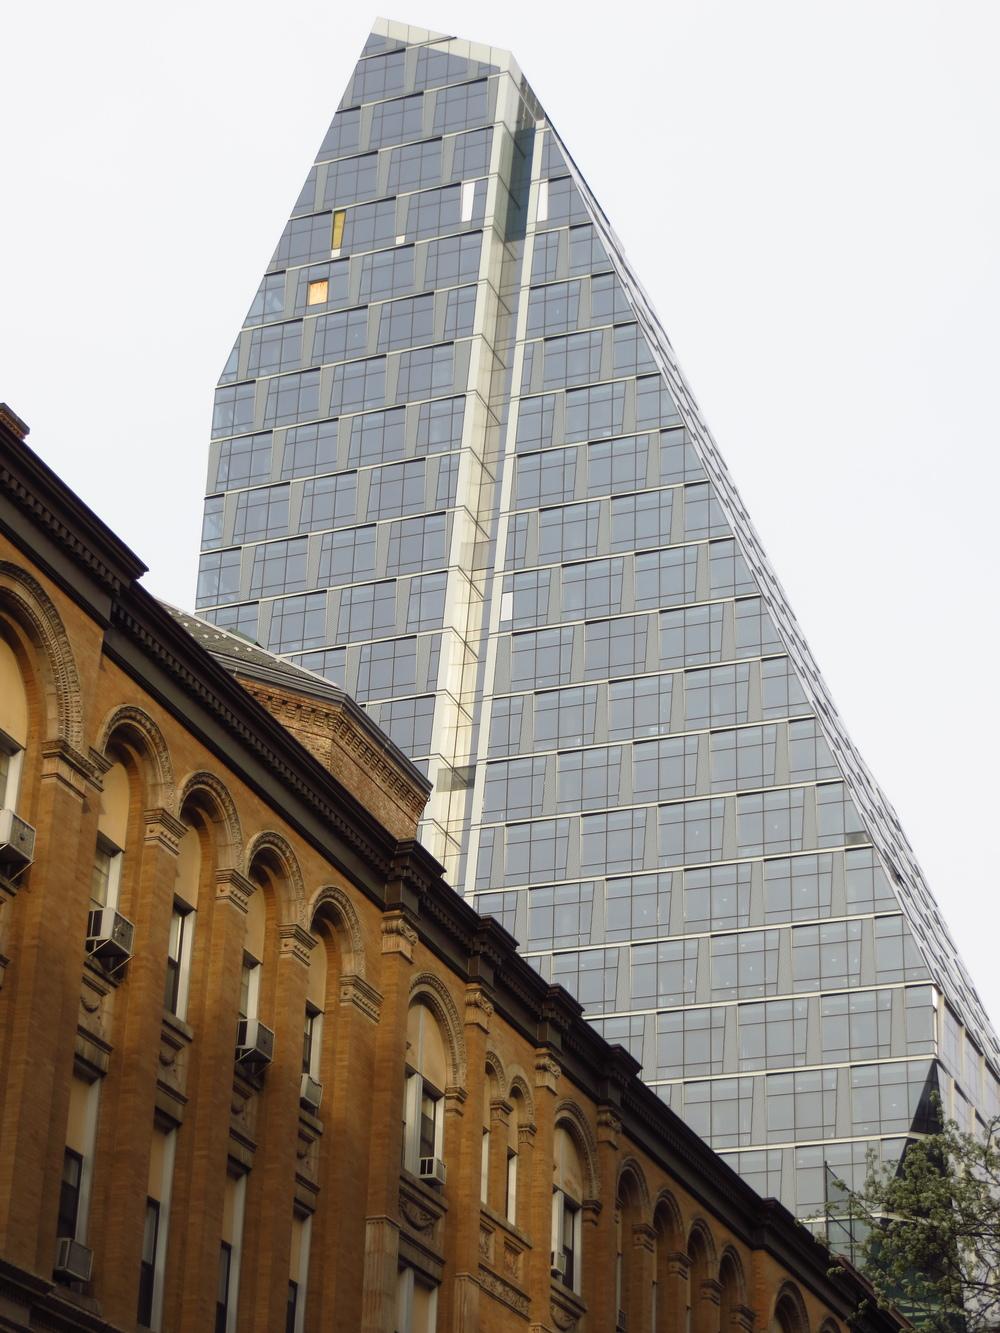 Neat building